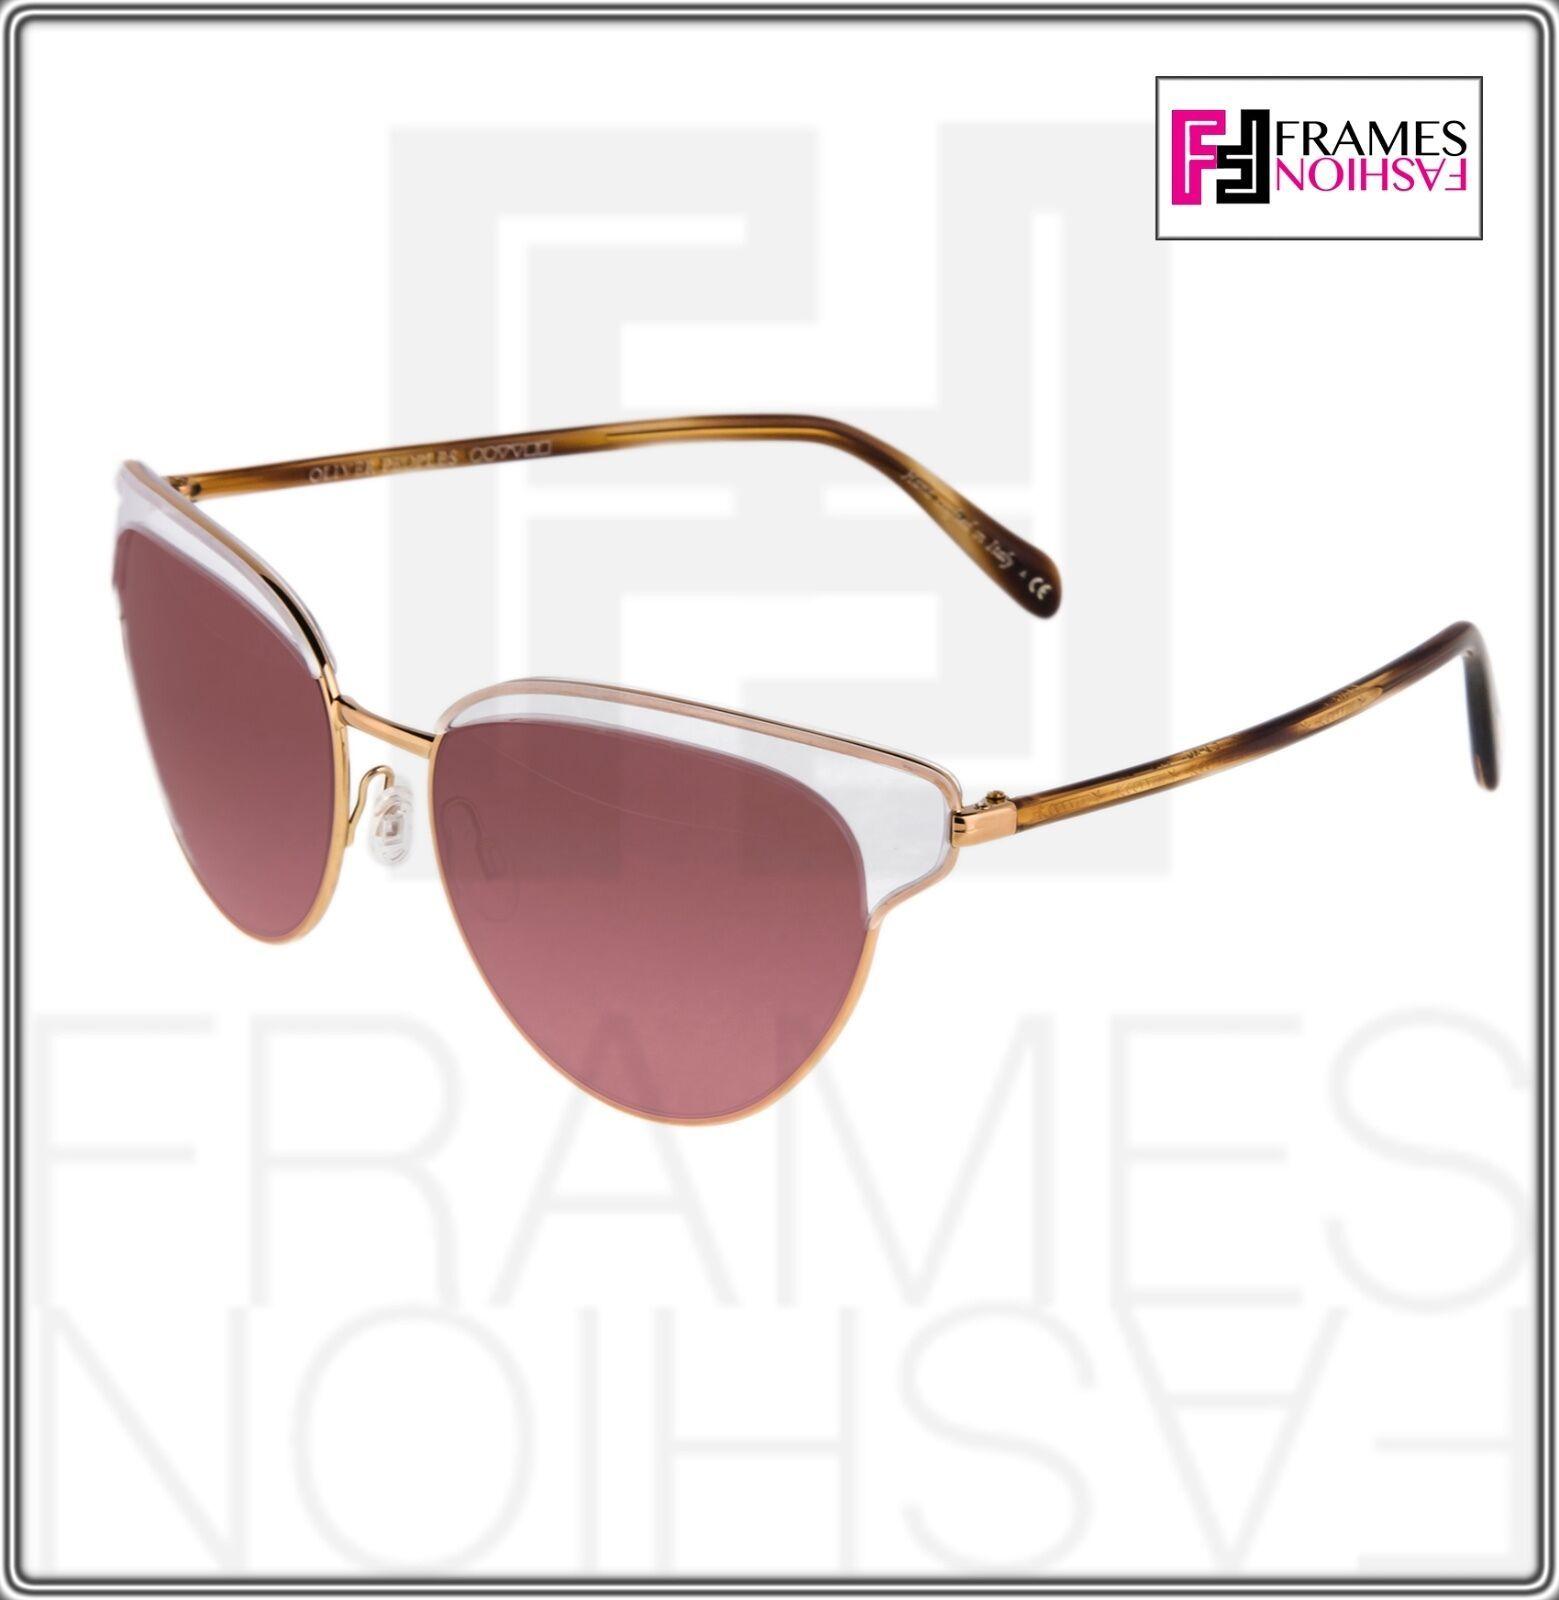 OLIVER PEOPLES JOSA OV1187S Rose Gold Pink Crystal Cat Eye Sunglasses 1187 image 9